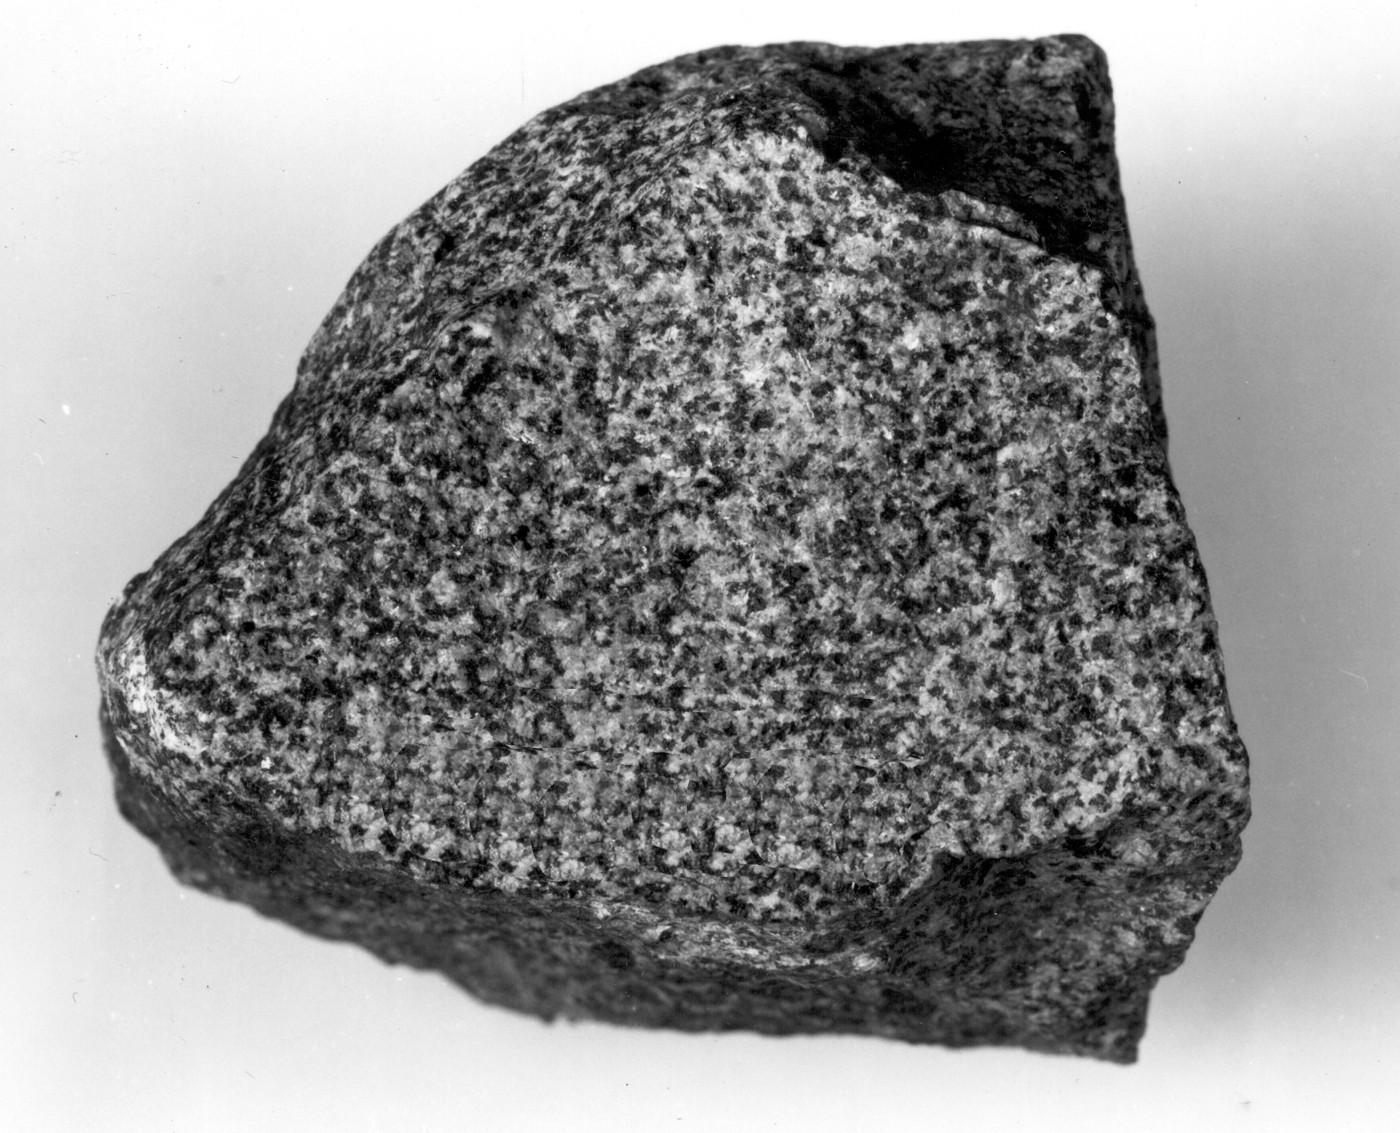 Hard Rock clipart igneous rock Types Navruza Rock Khamrakulova IHSL